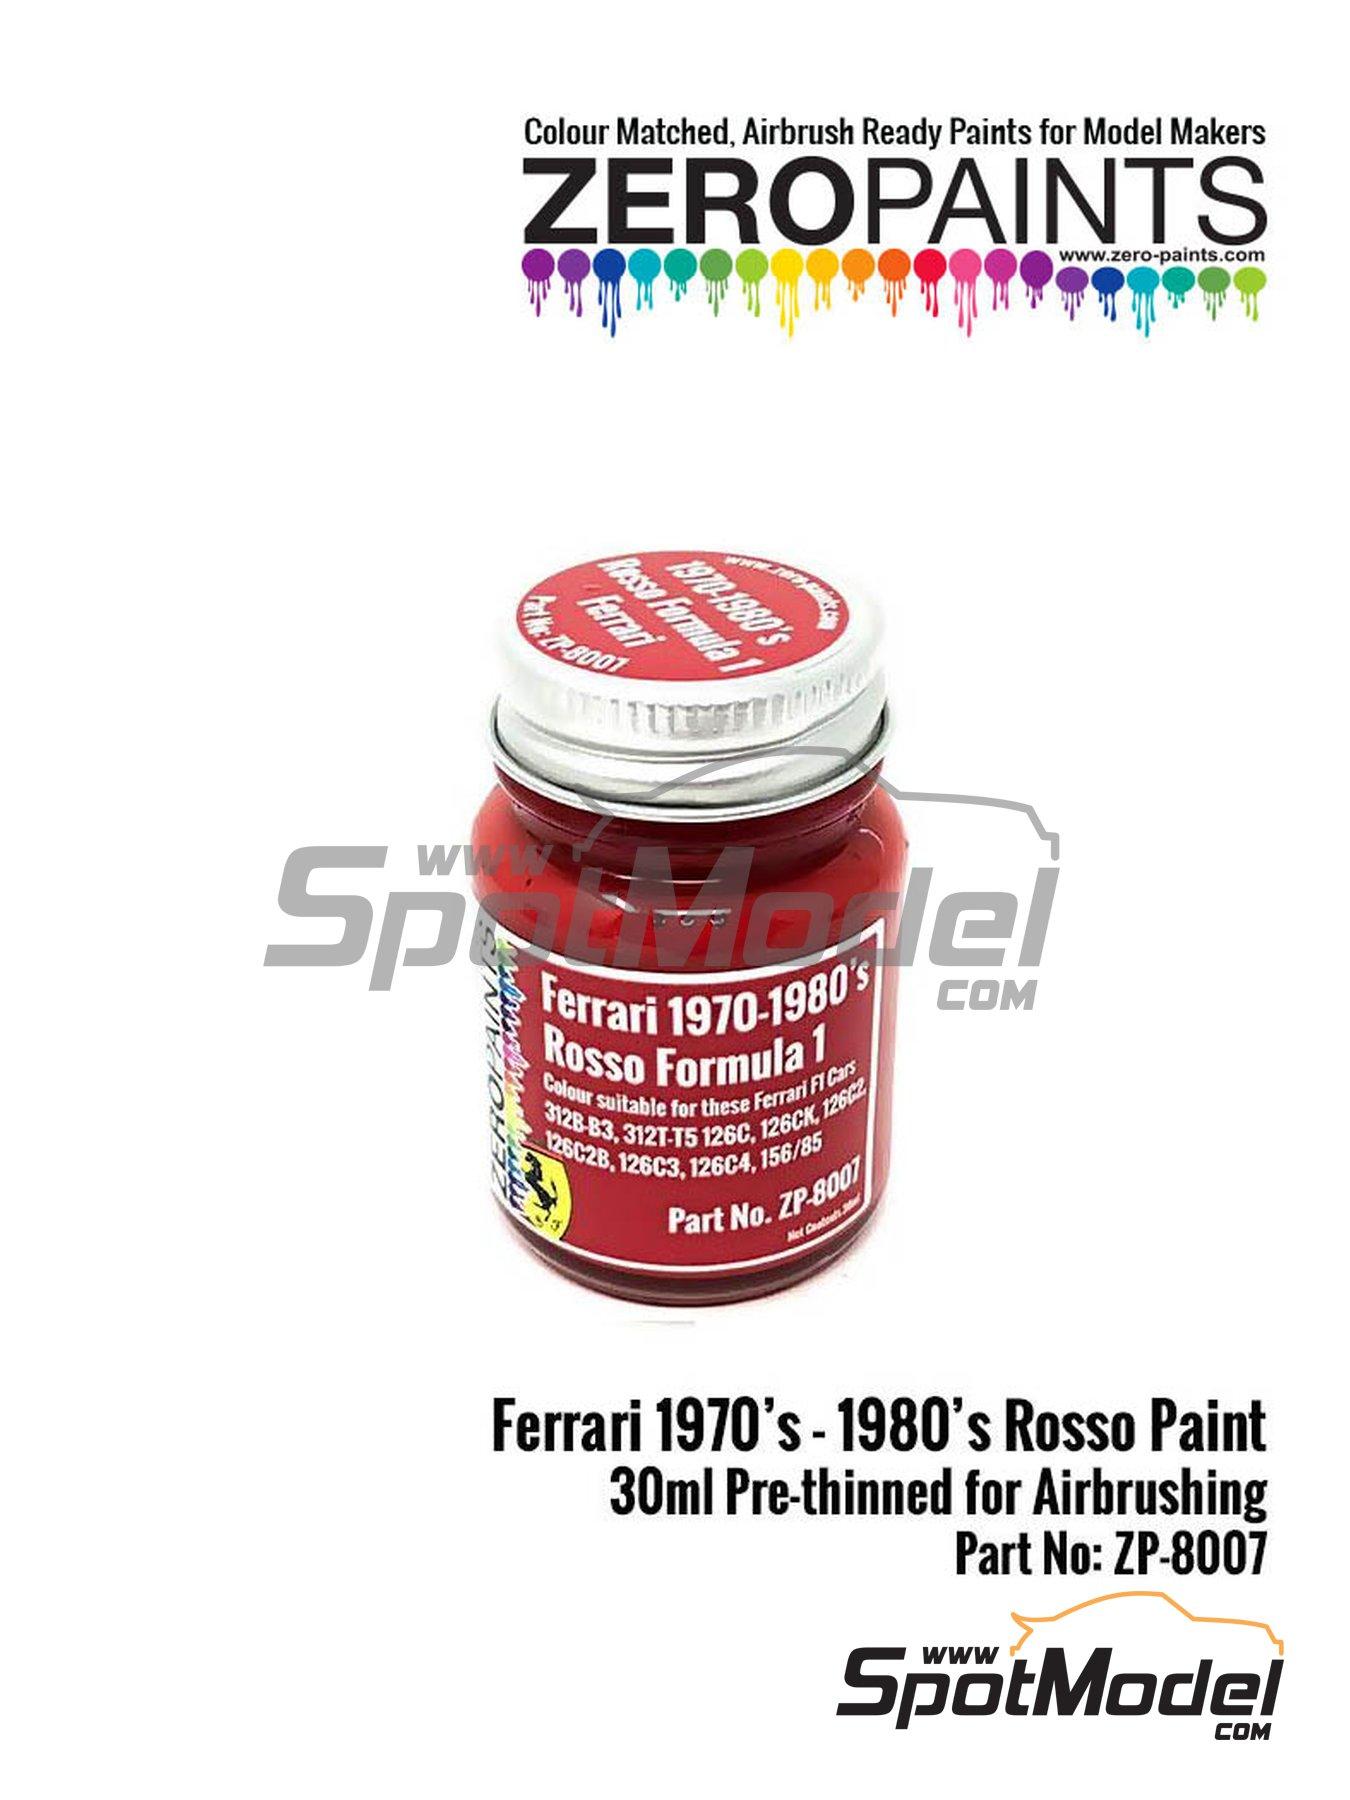 Rojo Ferrari F1 años 70 y 80 - Ferrari 1970s-80s rosso Formula1 - 1 x 30ml | Pintura fabricado por Zero Paints (ref.ZP-8007-F1-70-80) image